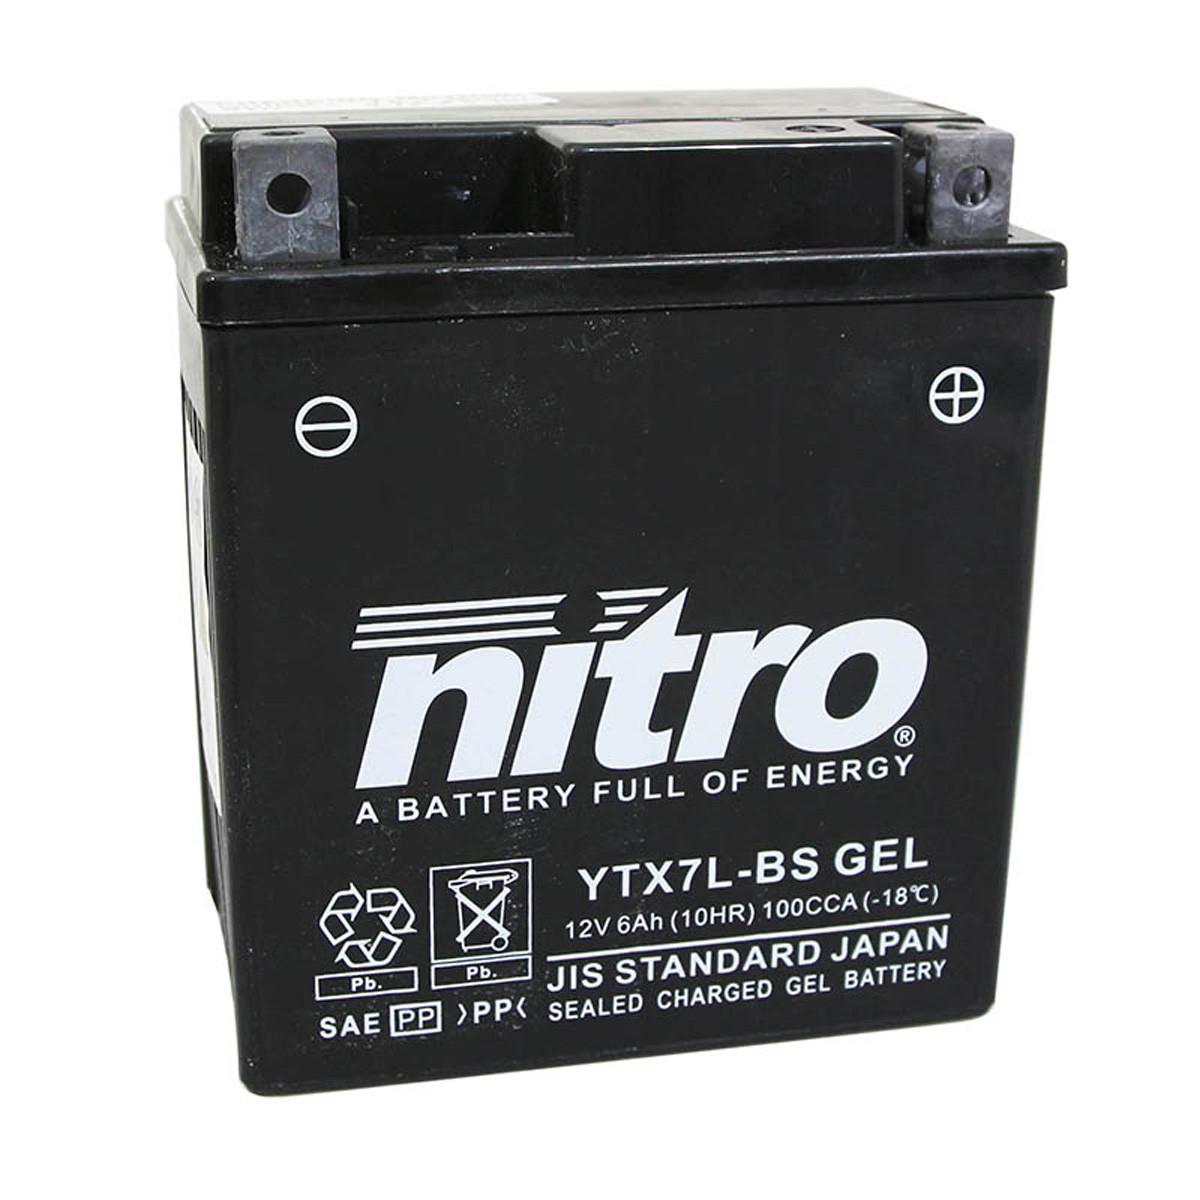 Batterie 12V 6Ah YTX7LBS - Nitro au Gel